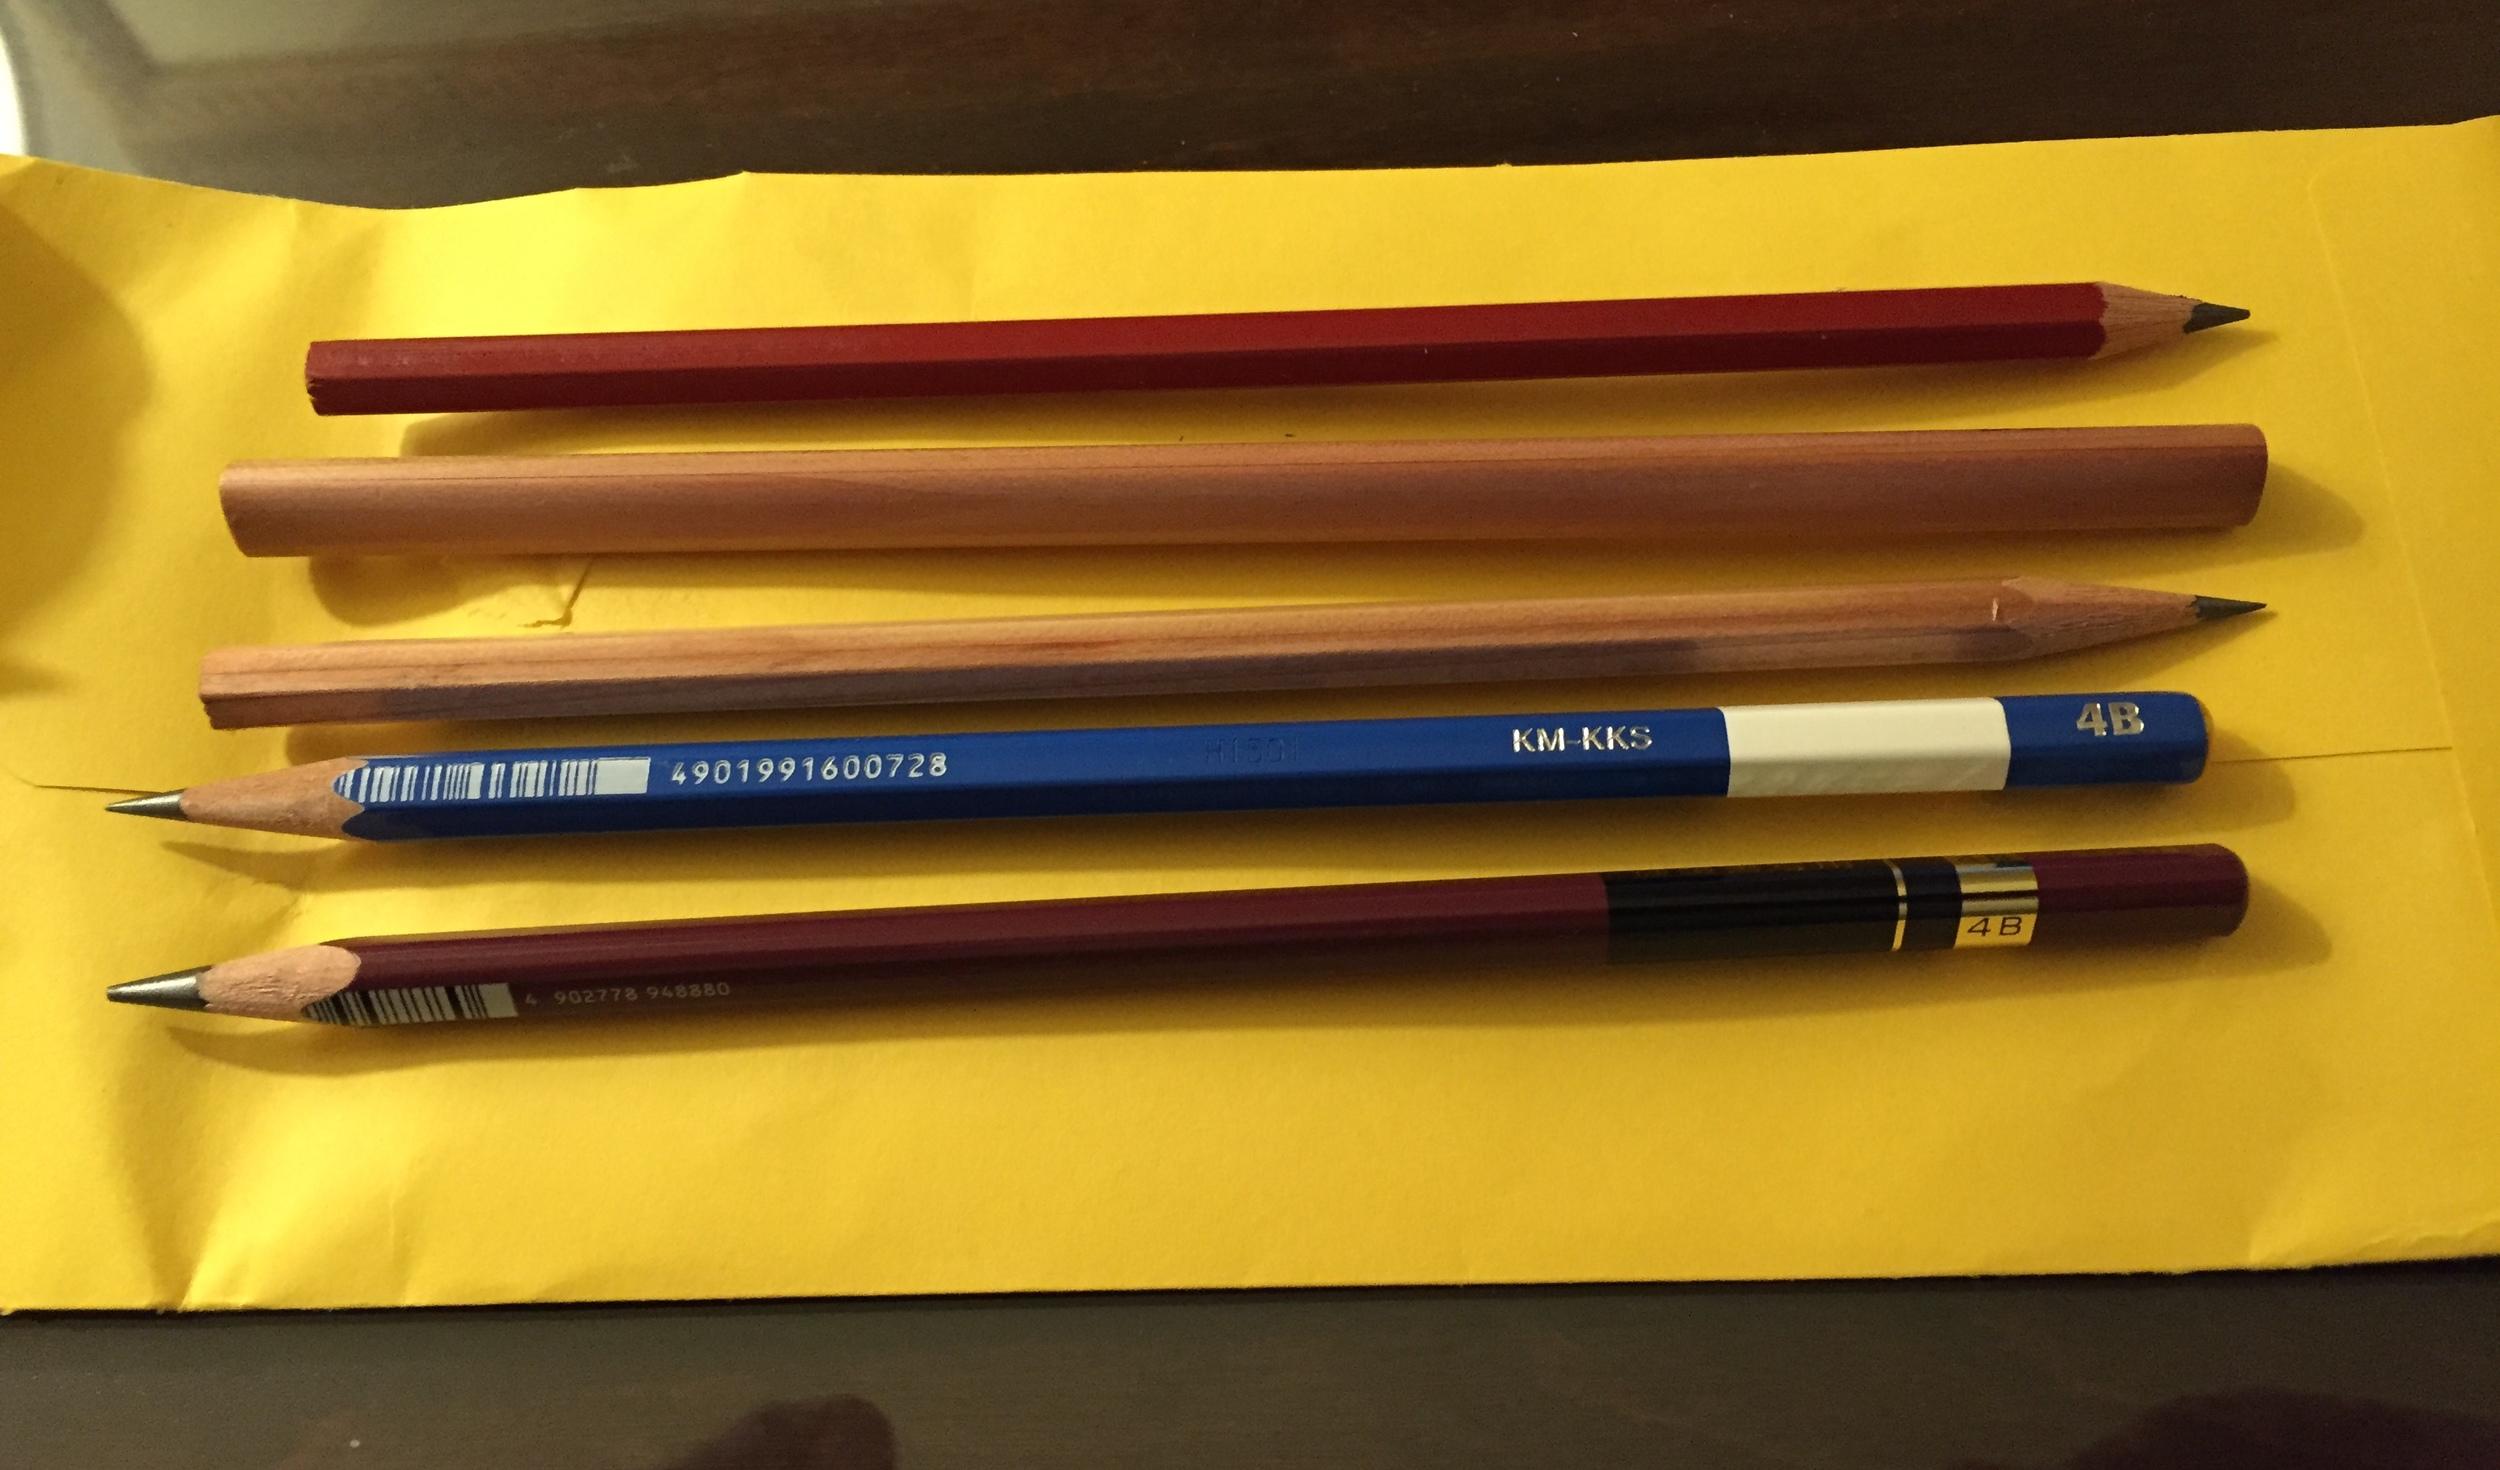 From the top: Viarco Desenho B (No. 1); Tombow 2B triangular pencil (mini jumbo); Viarco Eco HB (No. 2); Tombow Mono 4B; and Triangular Mitsubishi Penmanship Pencil (4B). Yes, I exercised some self-restraint.